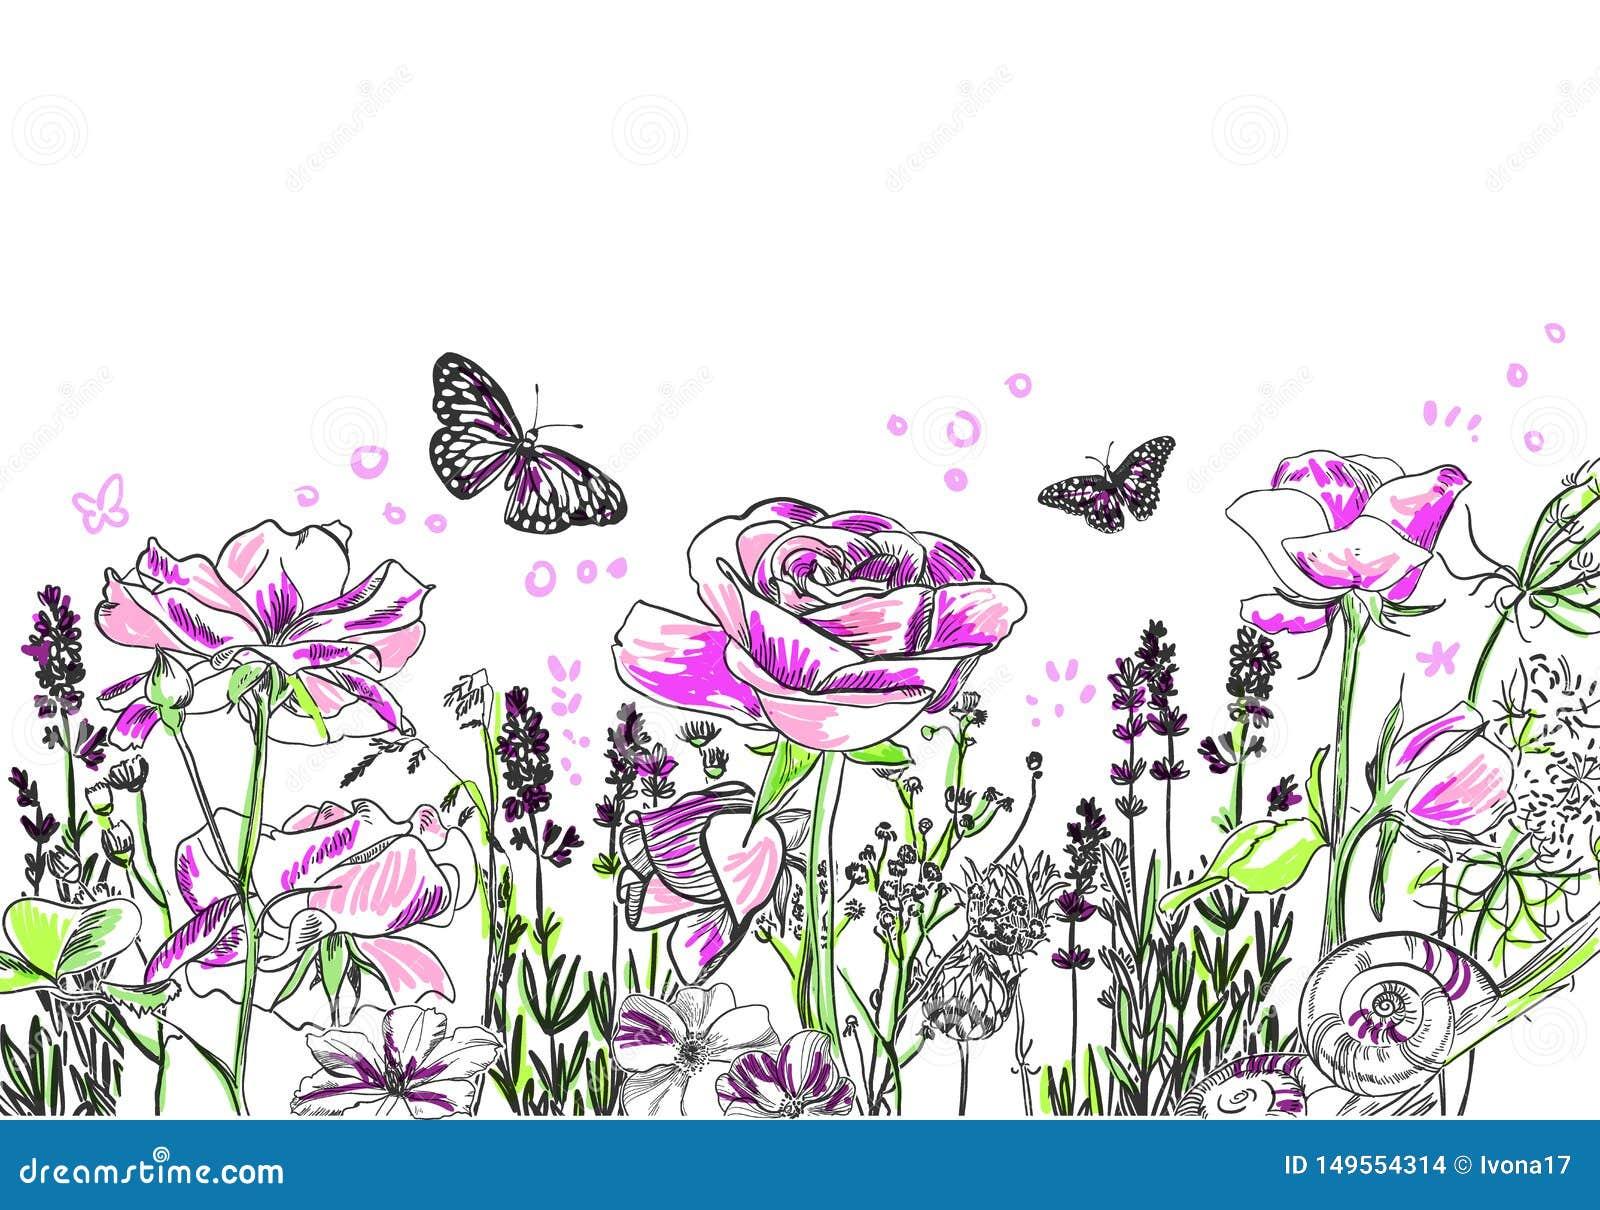 Lavendel stieg Blumenvektorkarten-Hintergrundpurpur